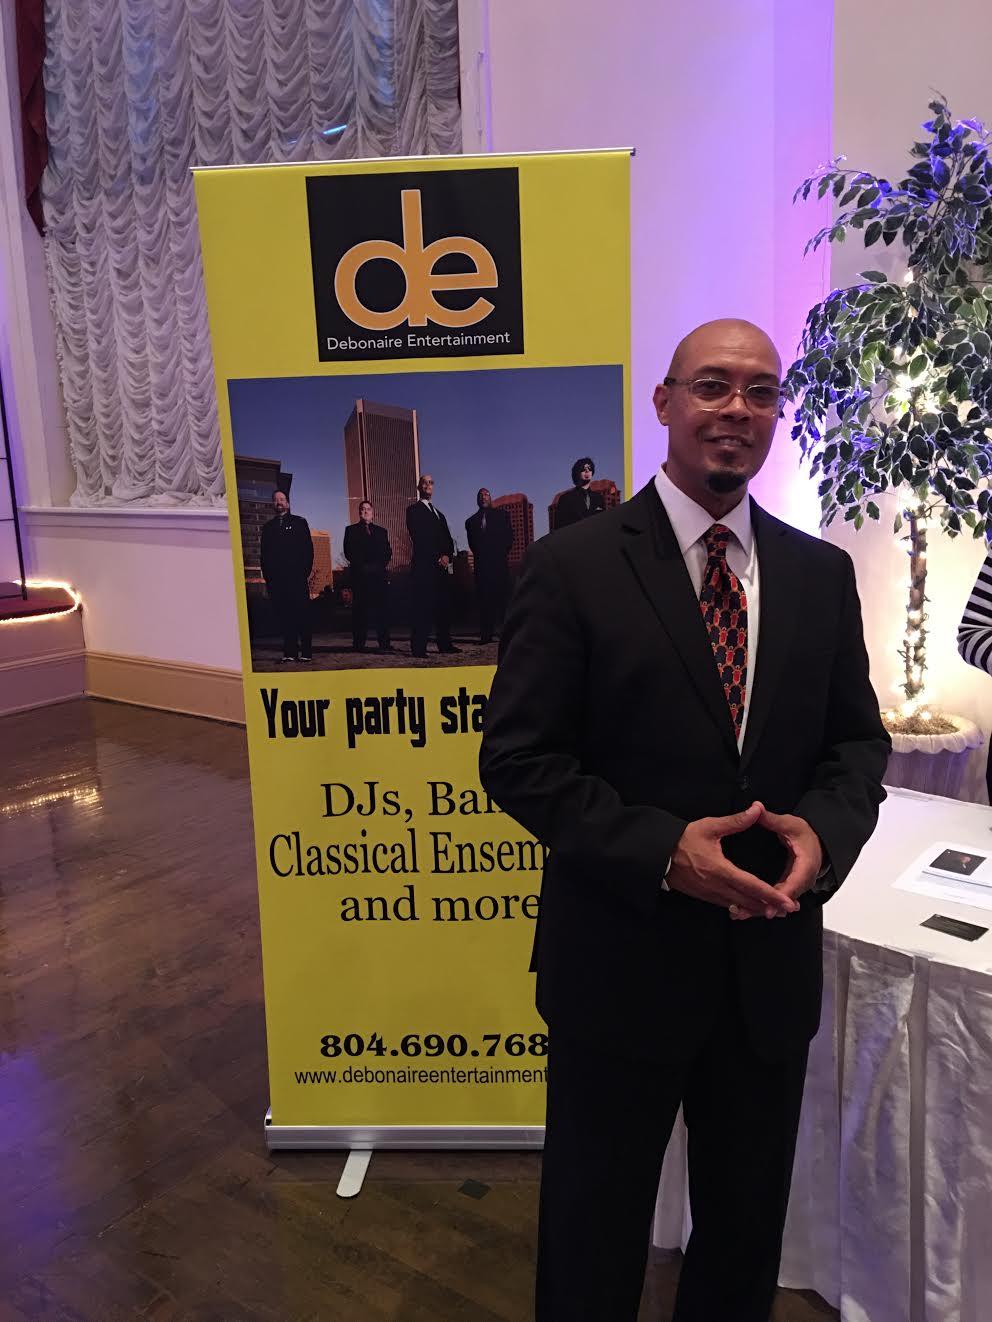 Eric owner of Debonaire Entertainment look so... well... debonaire!